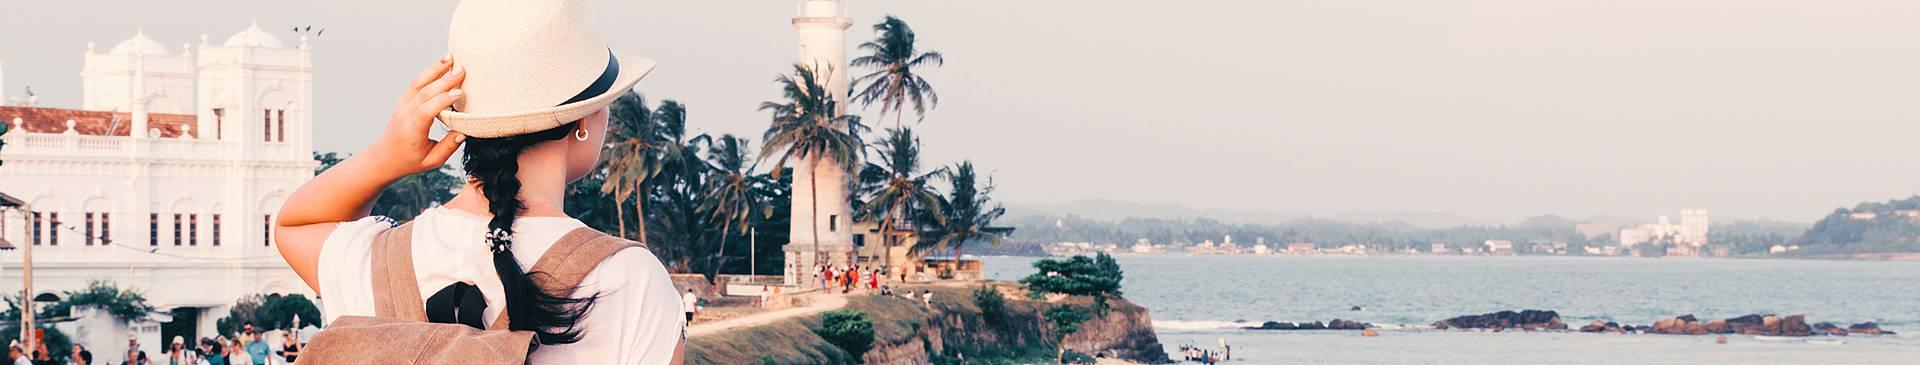 Solo tours in Sri Lanka